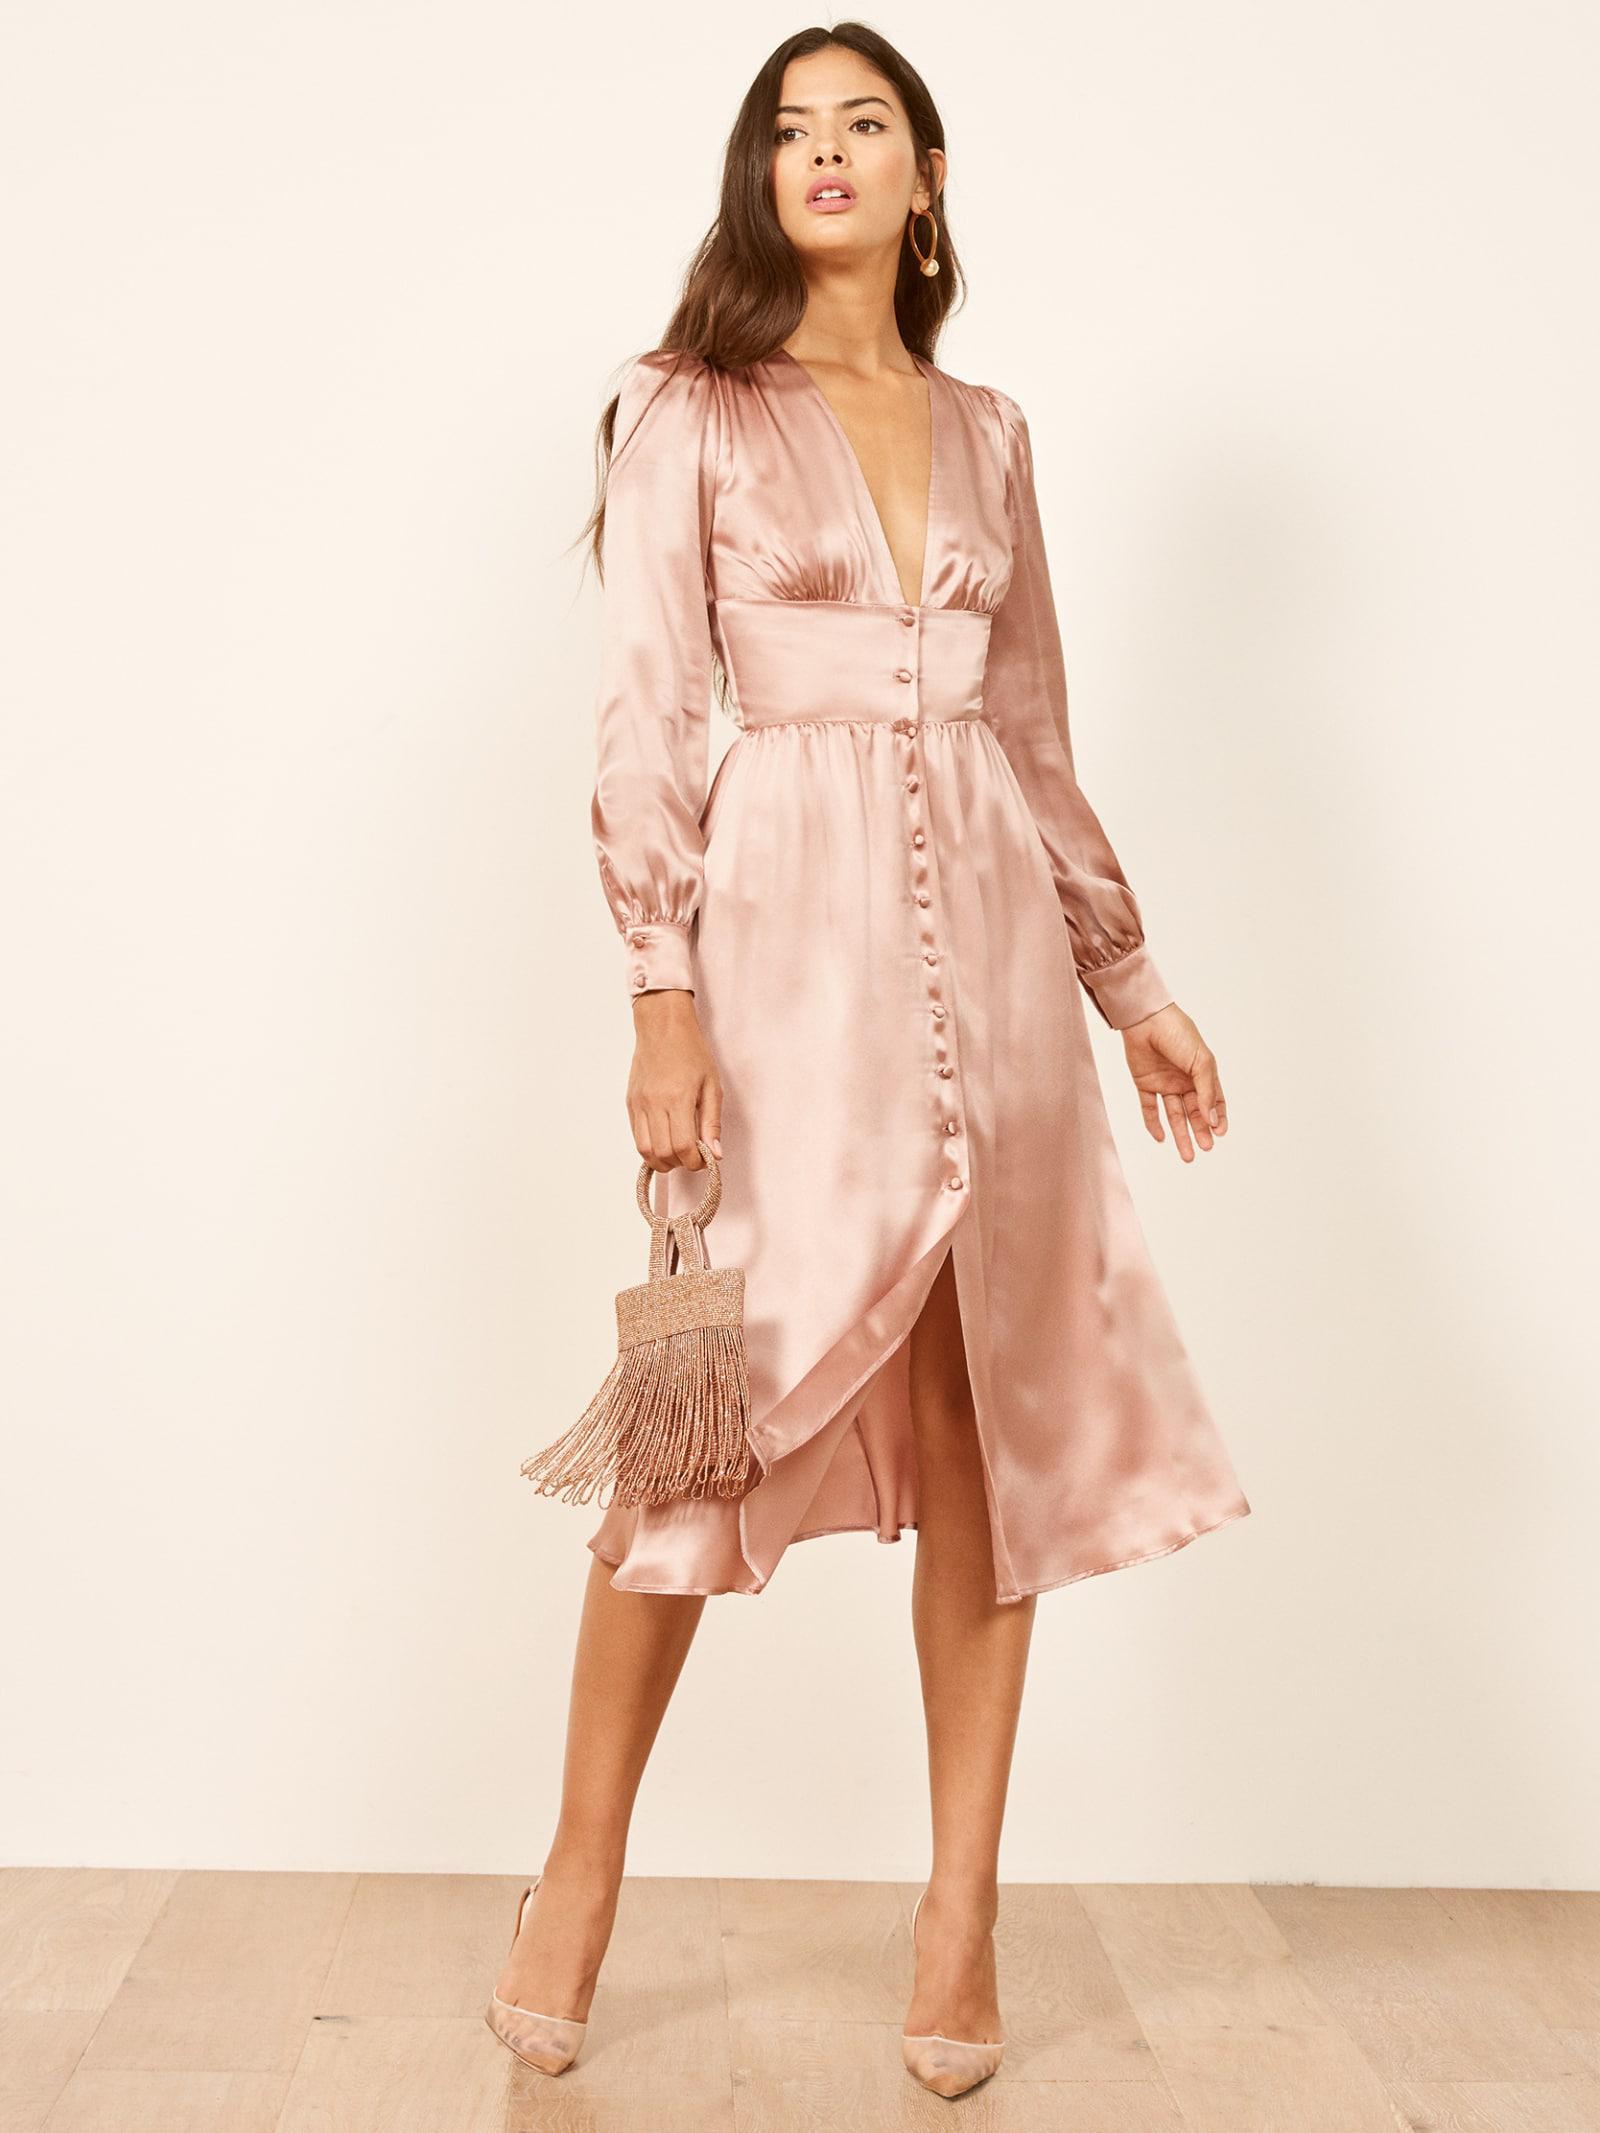 a5993f7b7d2 Reformation Nicola Dress in Pink - Lyst